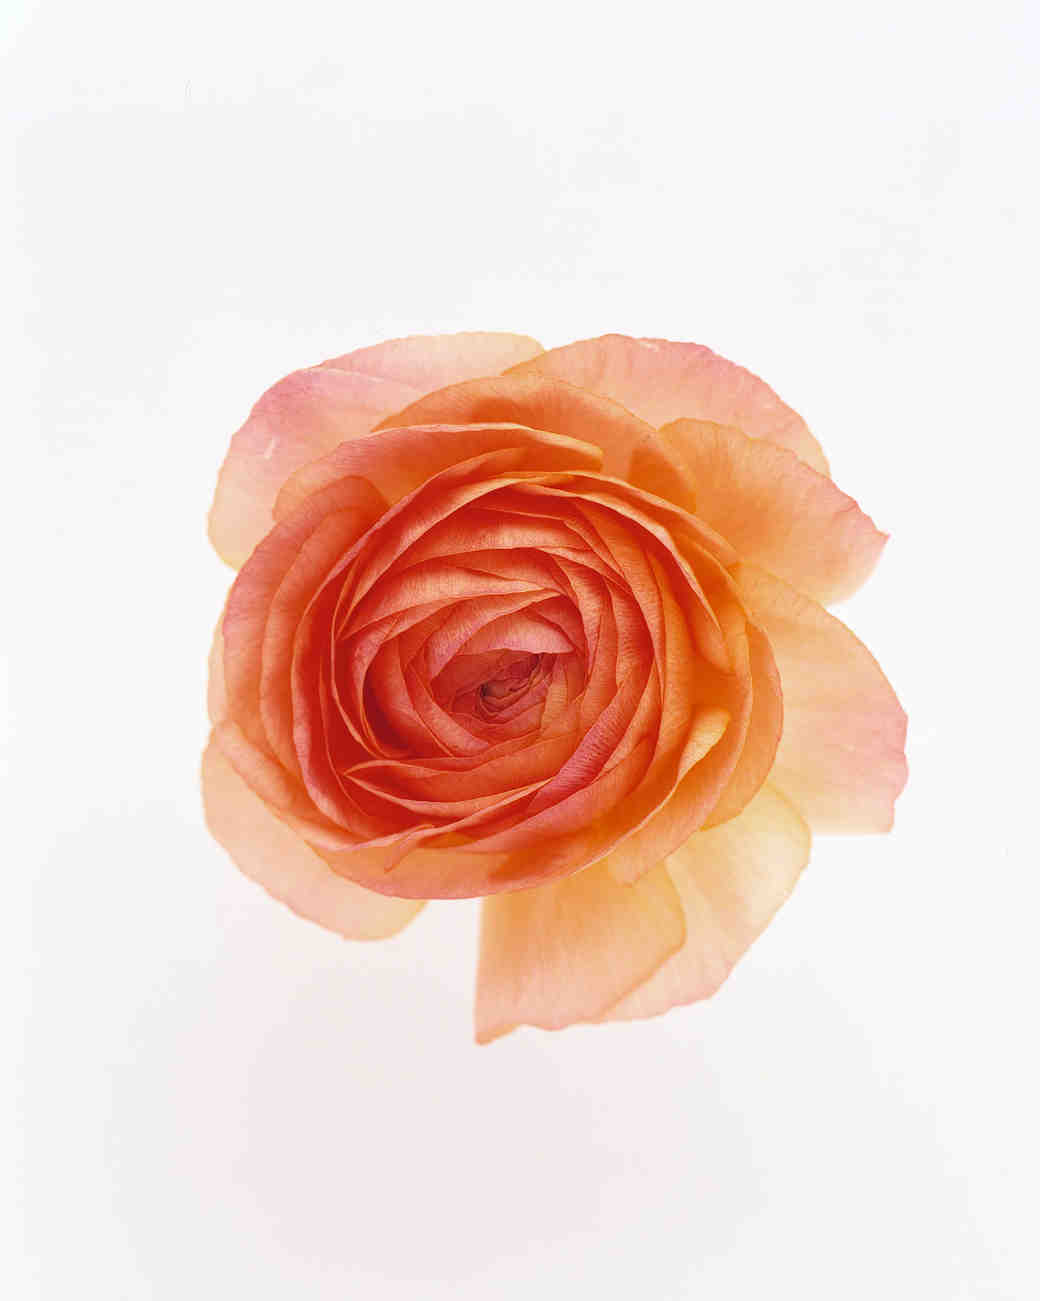 flower-glossary-ranunculus-peach-a98432-0415.jpg